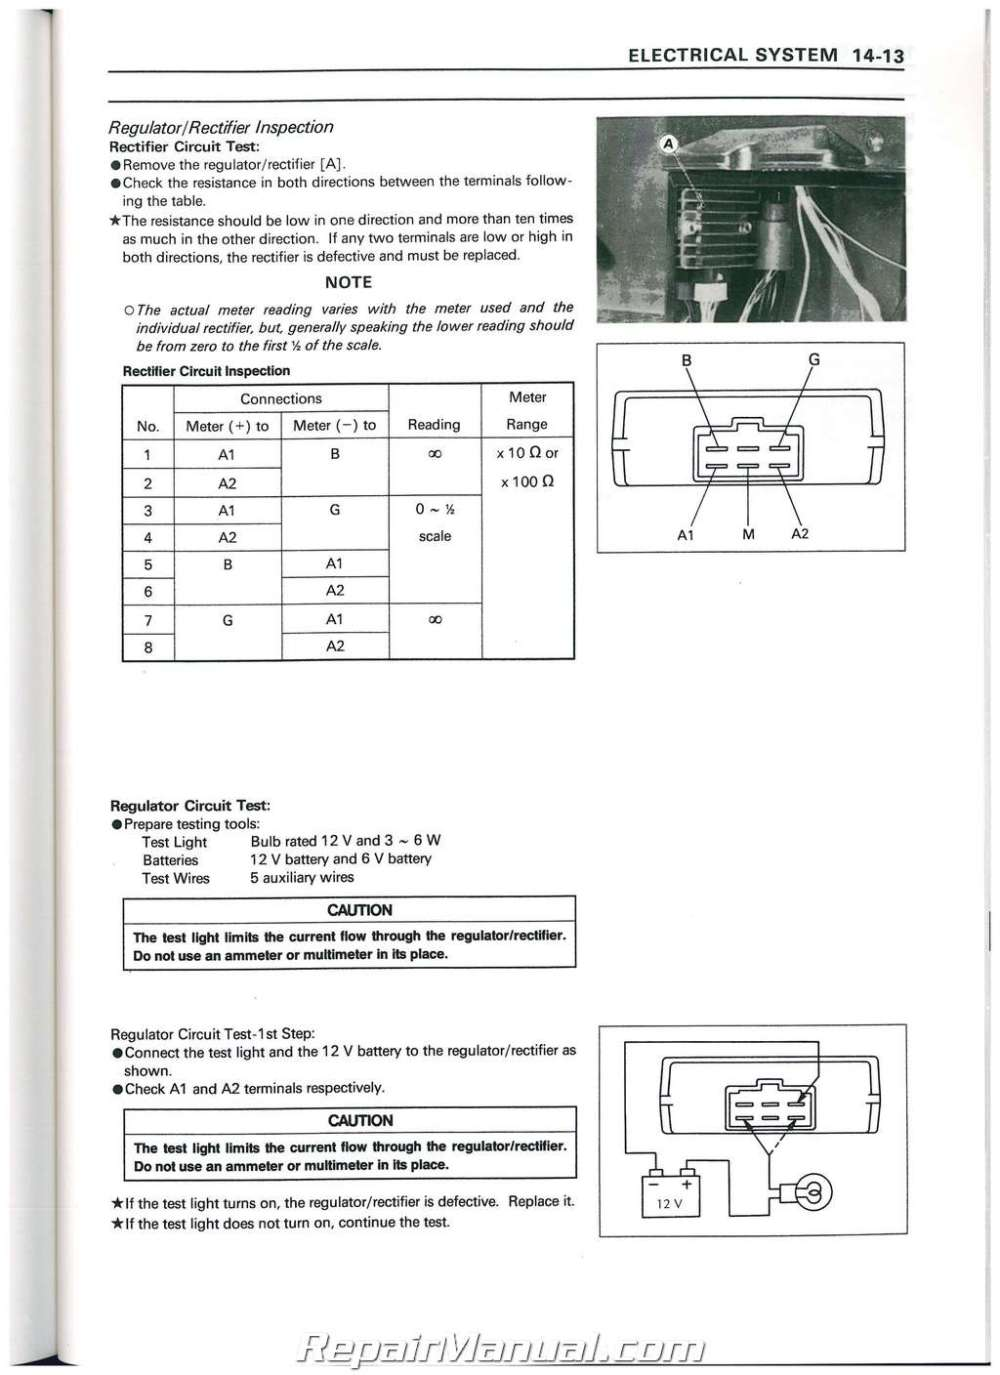 medium resolution of kawasaki mule kaf300 wiring diagram wiring diagram1990 u2013 2004 kawasaki kaf300a mule 500 520